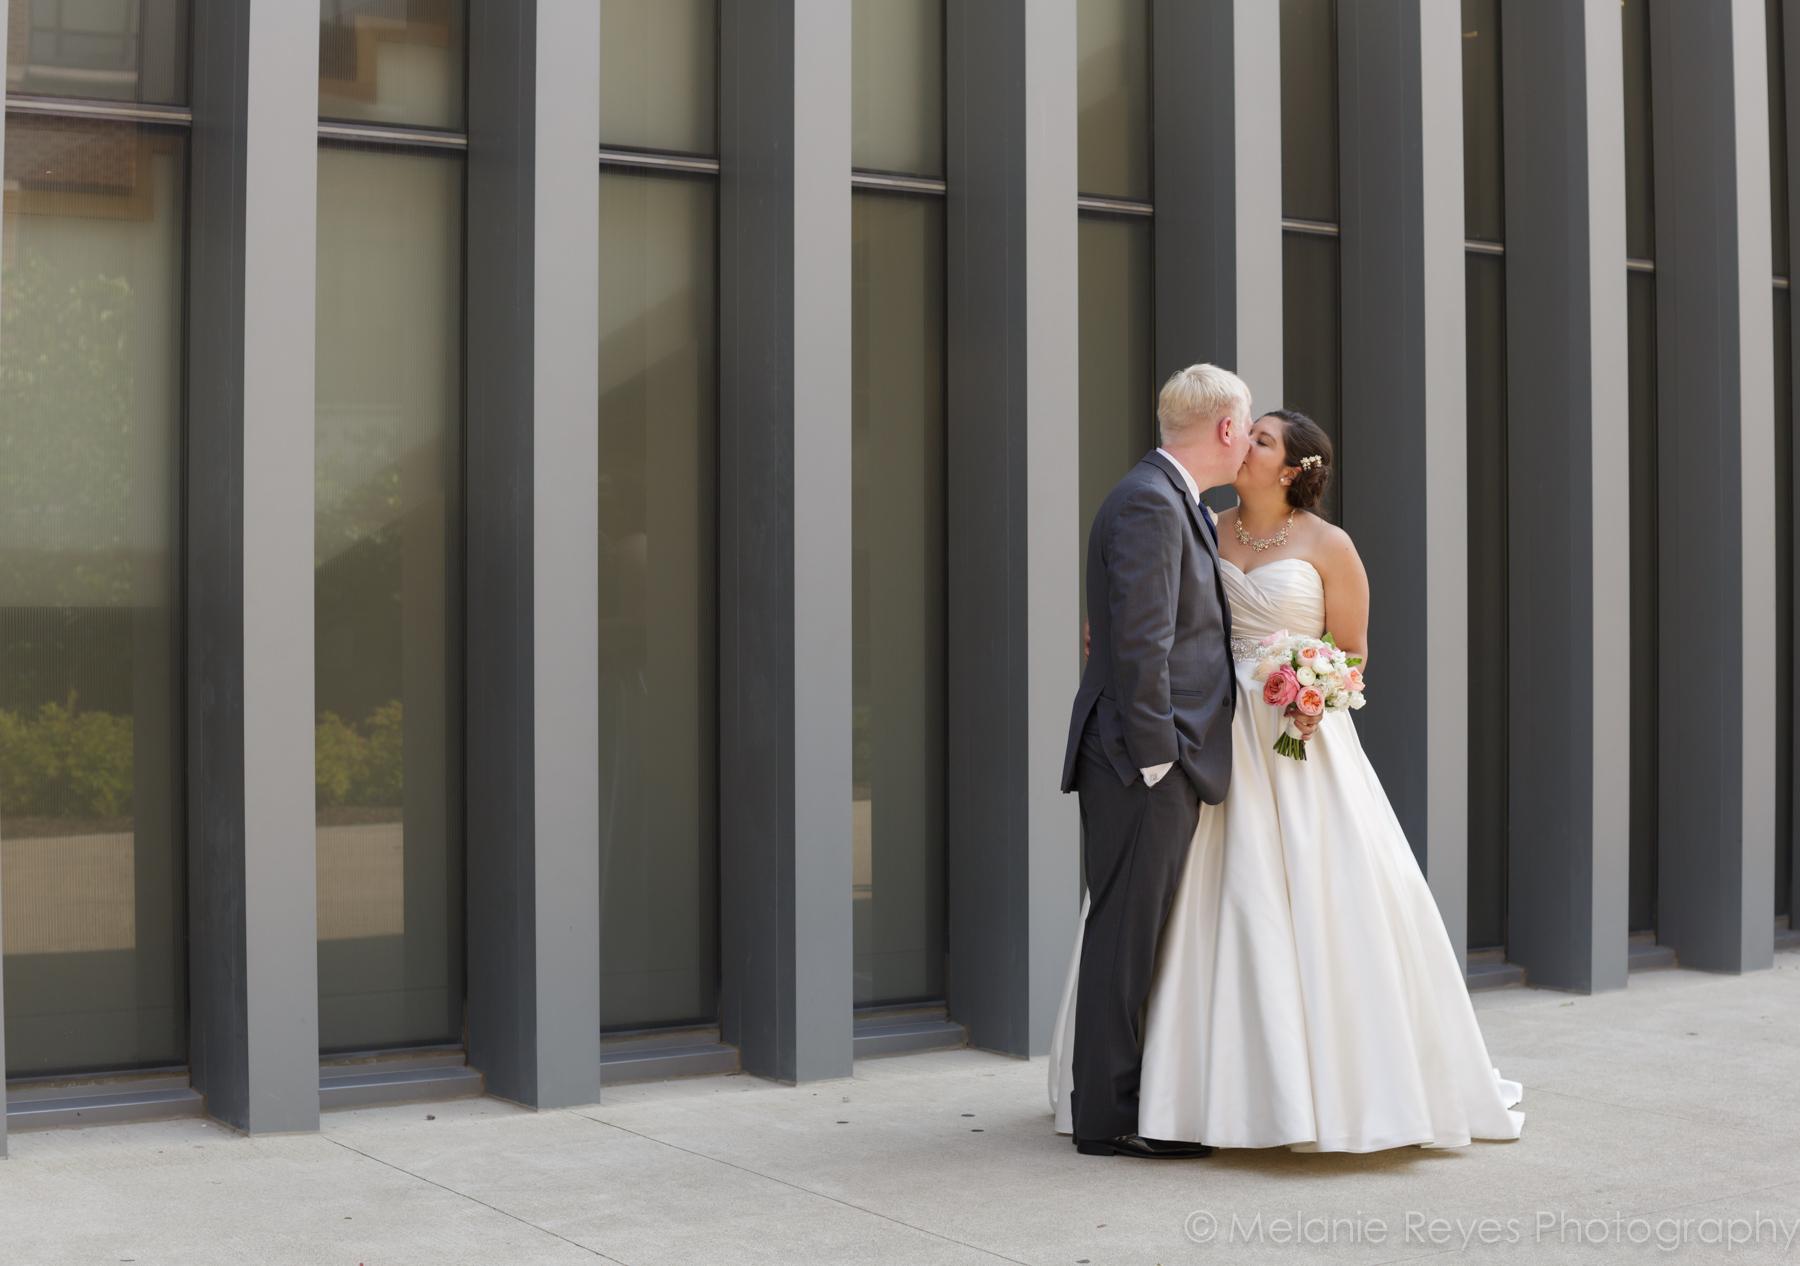 MC_annarbor_uofm_wedding_032